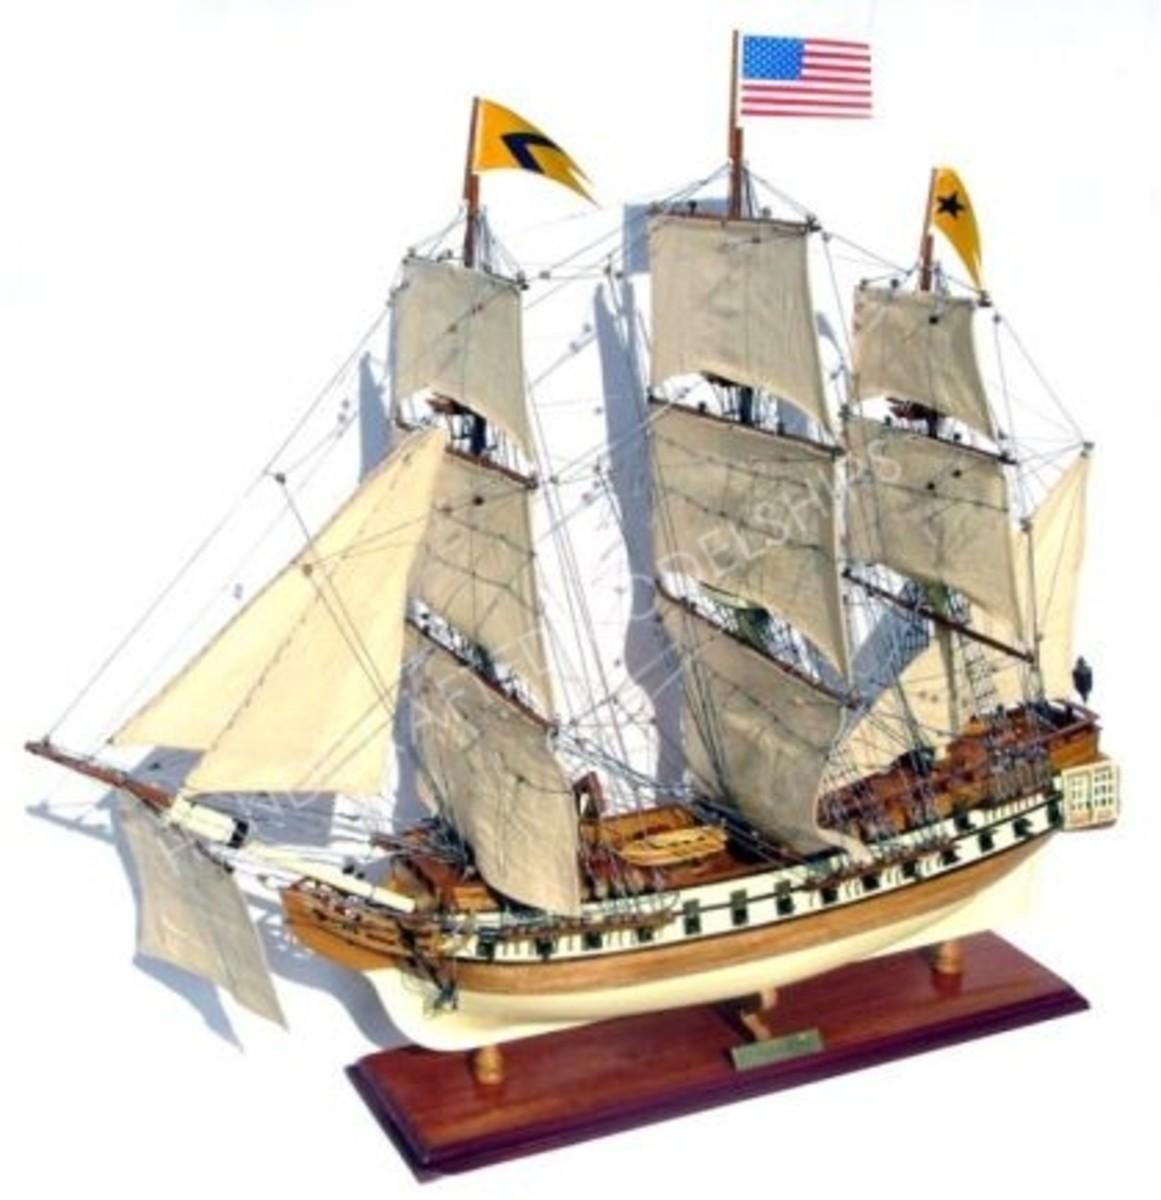 Assembled Model of the Original Frigate: USS Bonhomme Richard. Fought against the Serapis at the Battle of Flamborough Head. http://www.handcraftedmodelships.com/uss-bonhomme-richard-boat-model3.php